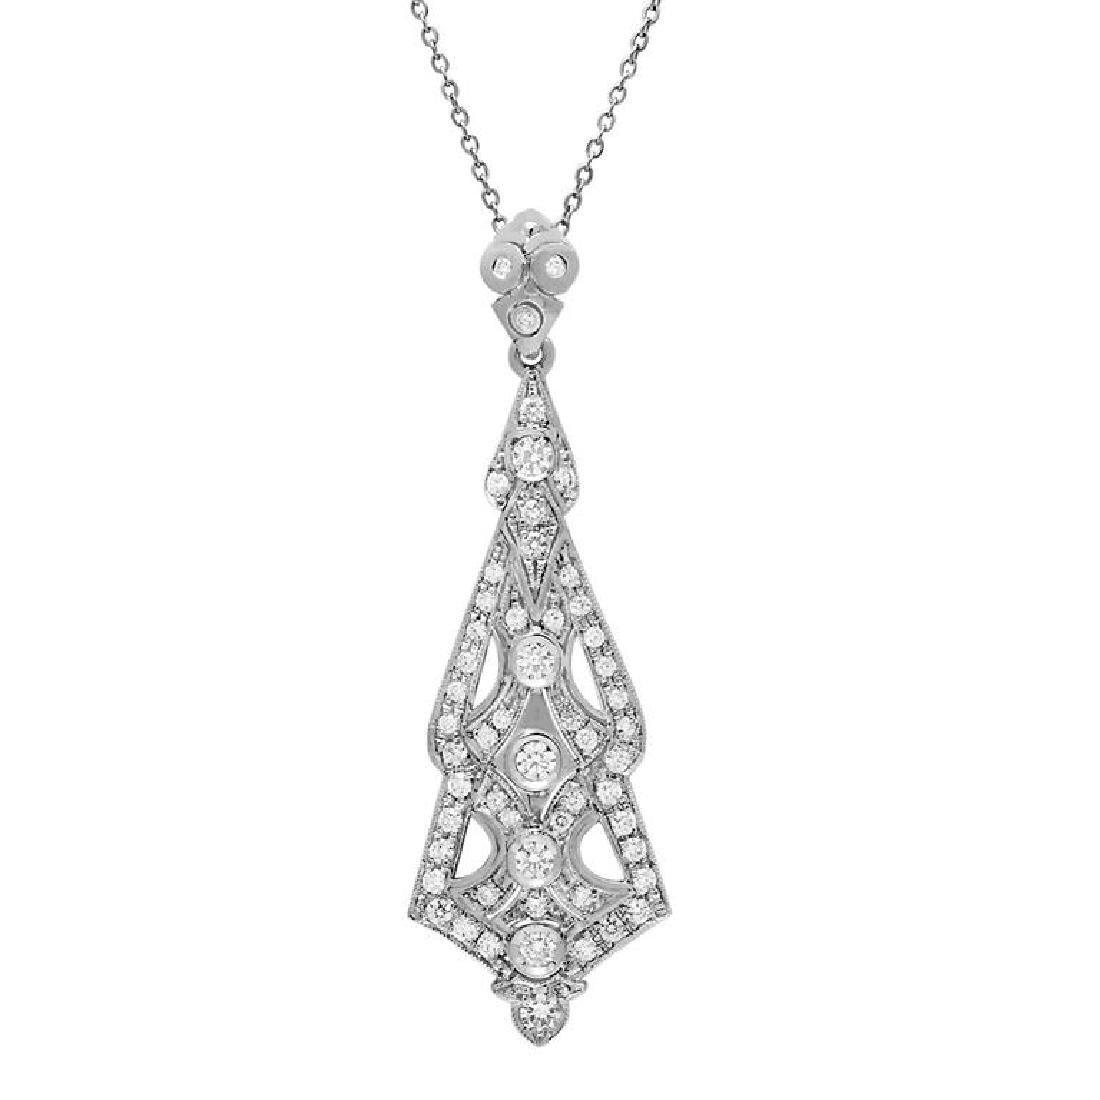 14k White Gold 2.56ct Diamond Pendant